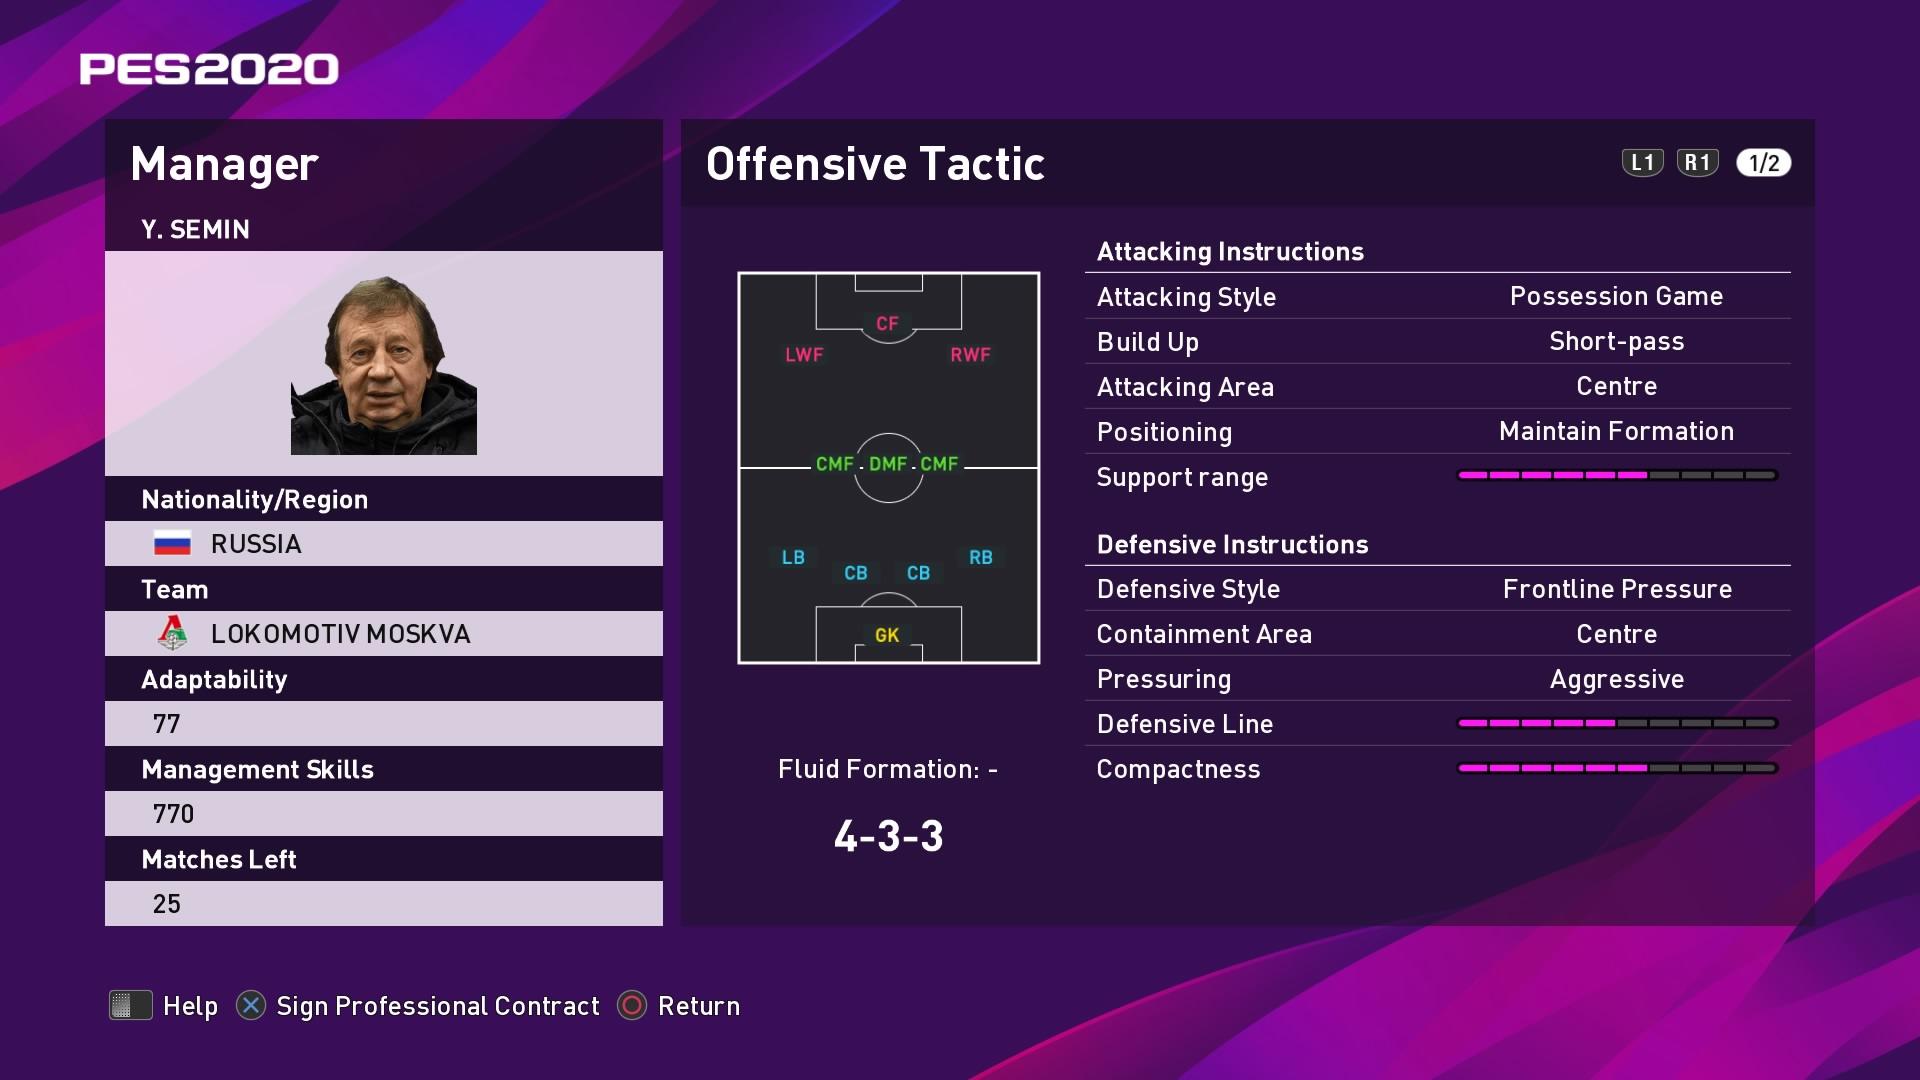 Y. Semin (2) (Yuri Semin) Offensive Tactic in PES 2020 myClub